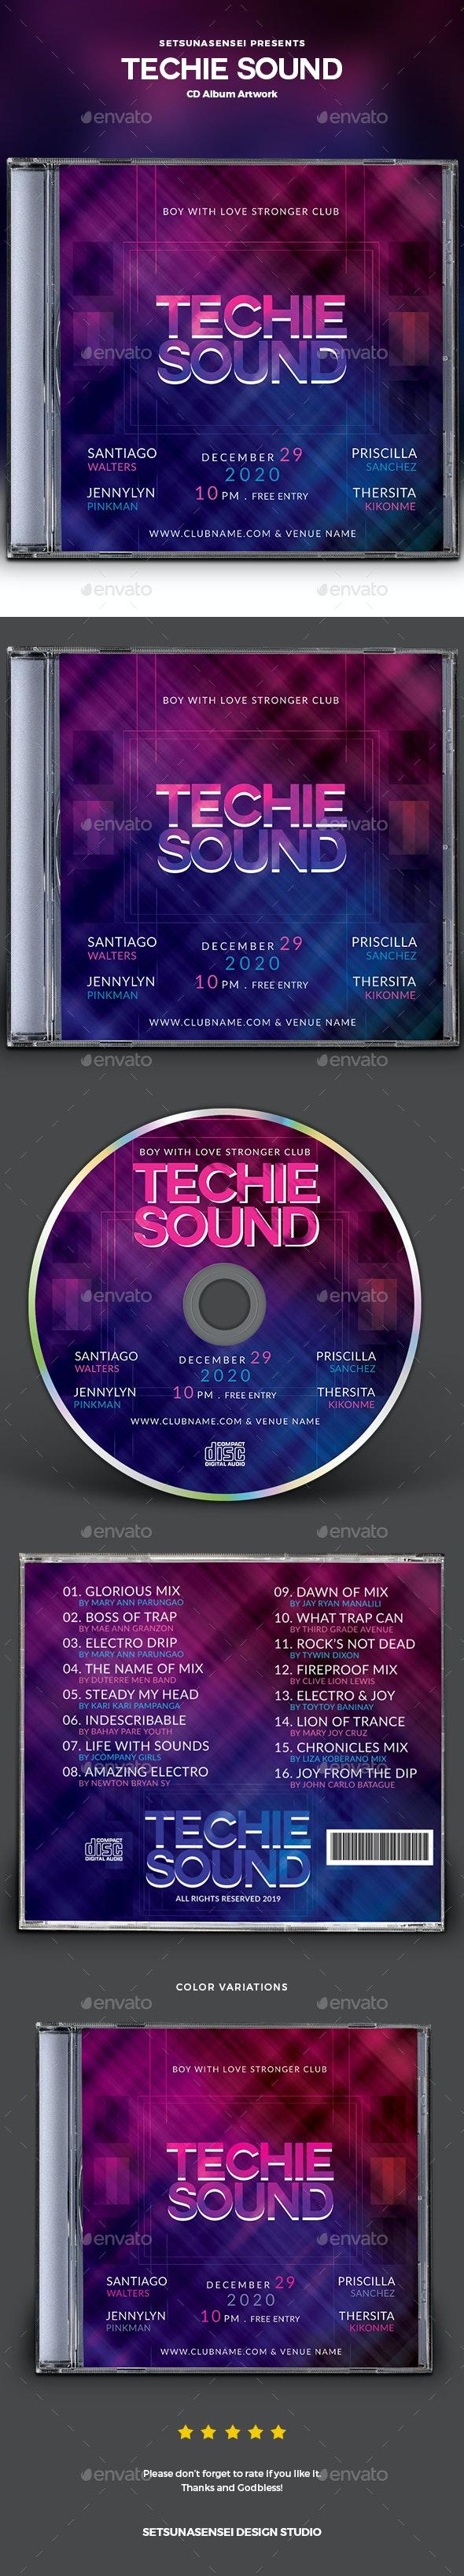 Techie Sound CD Album Artwork - CD & DVD Artwork Print Templates